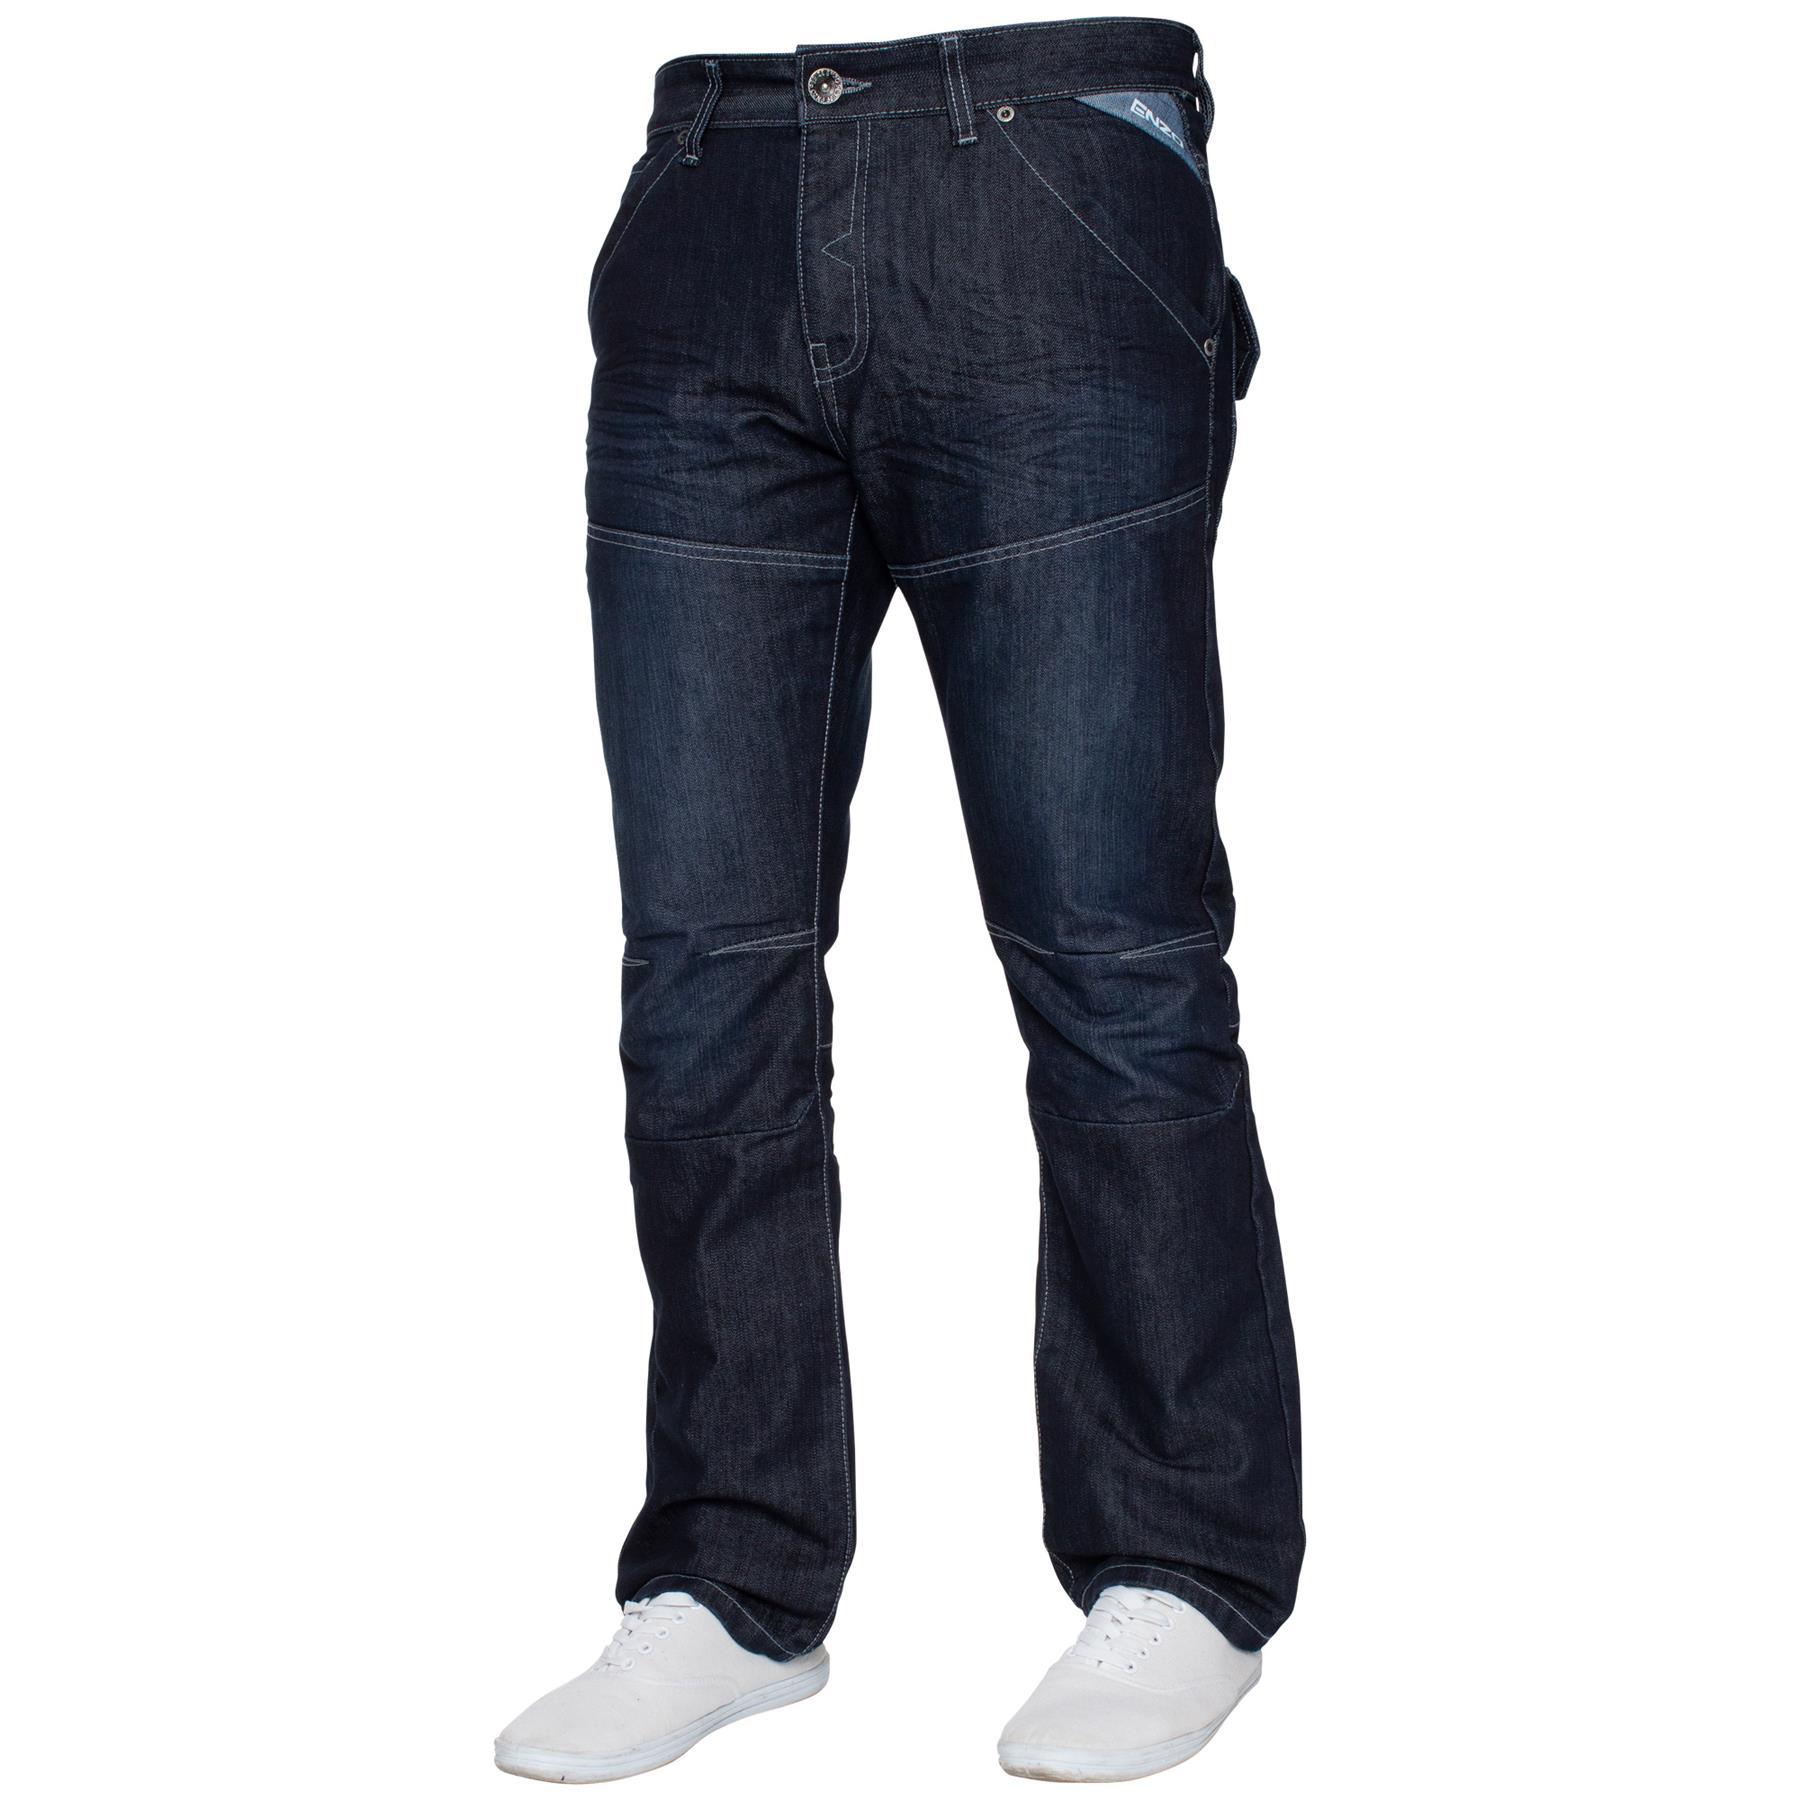 ENZO-Jeans-para-hombre-Big-Alto-Pierna-King-Size-Jeans-Pantalones-Chino-Pantalones-Pantalones-44-034 miniatura 71